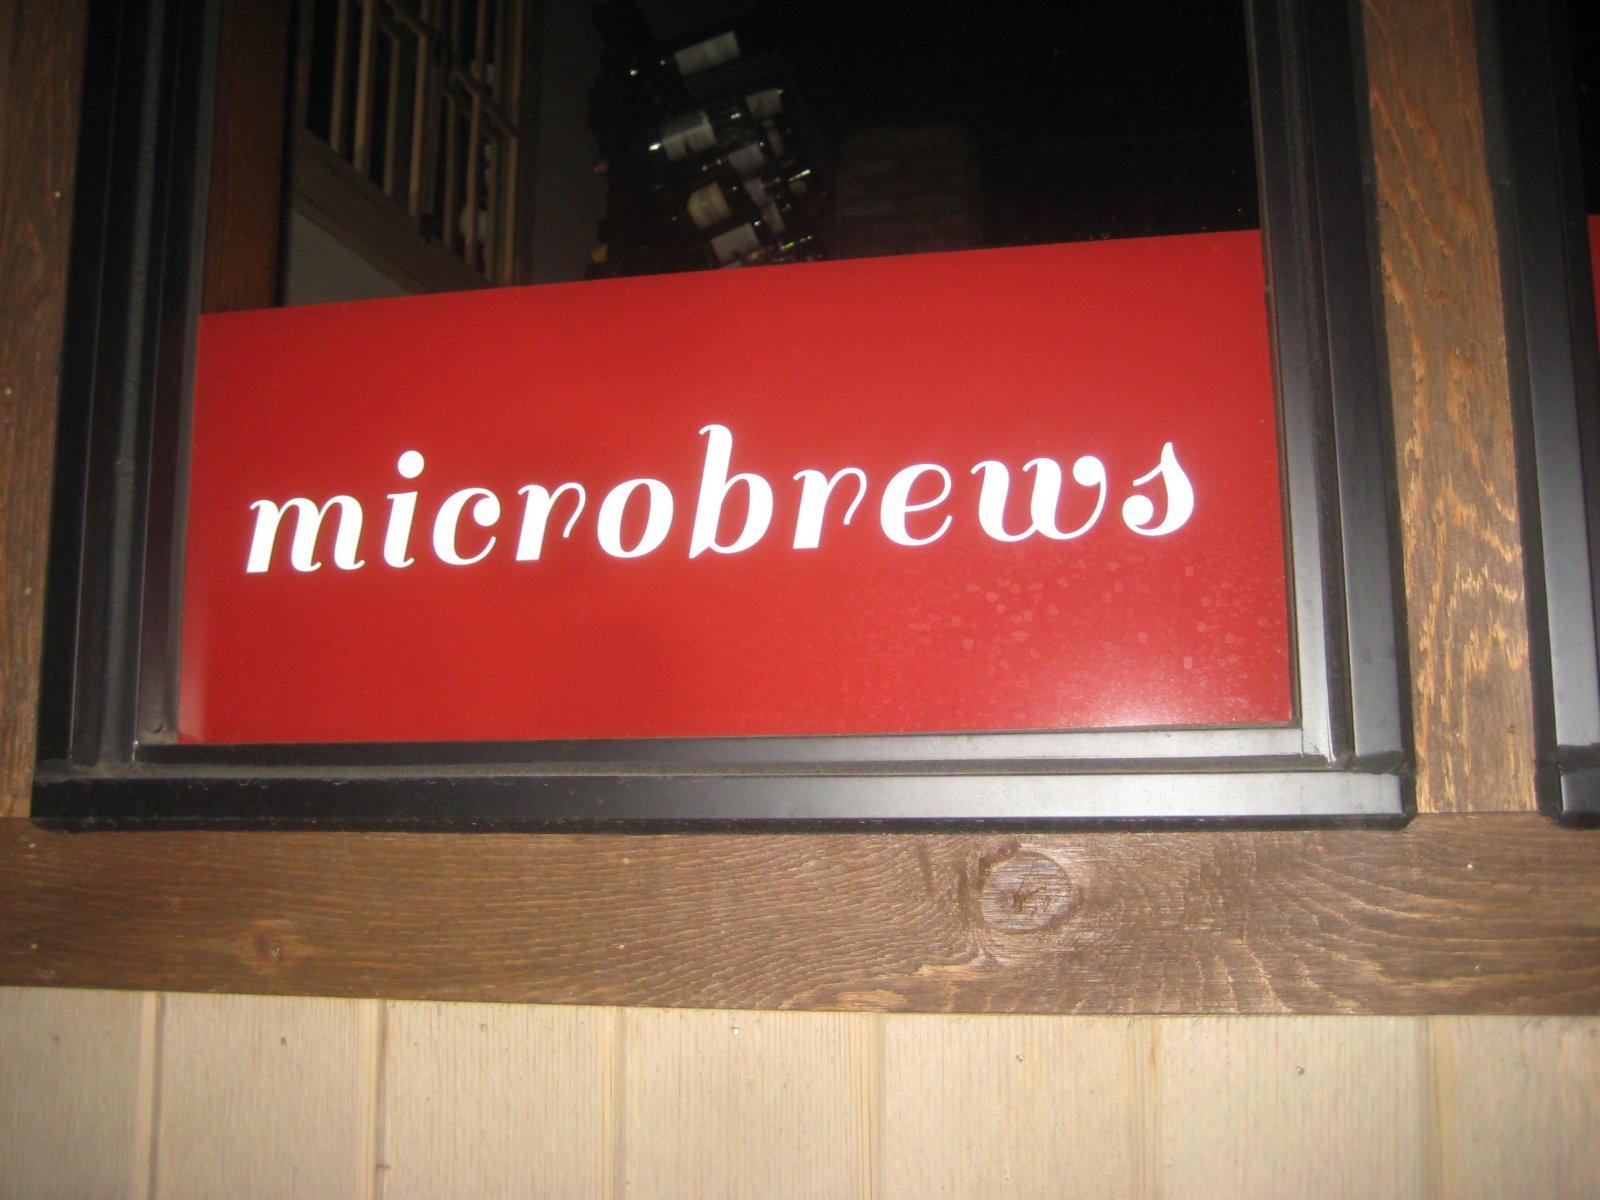 Microbrews.